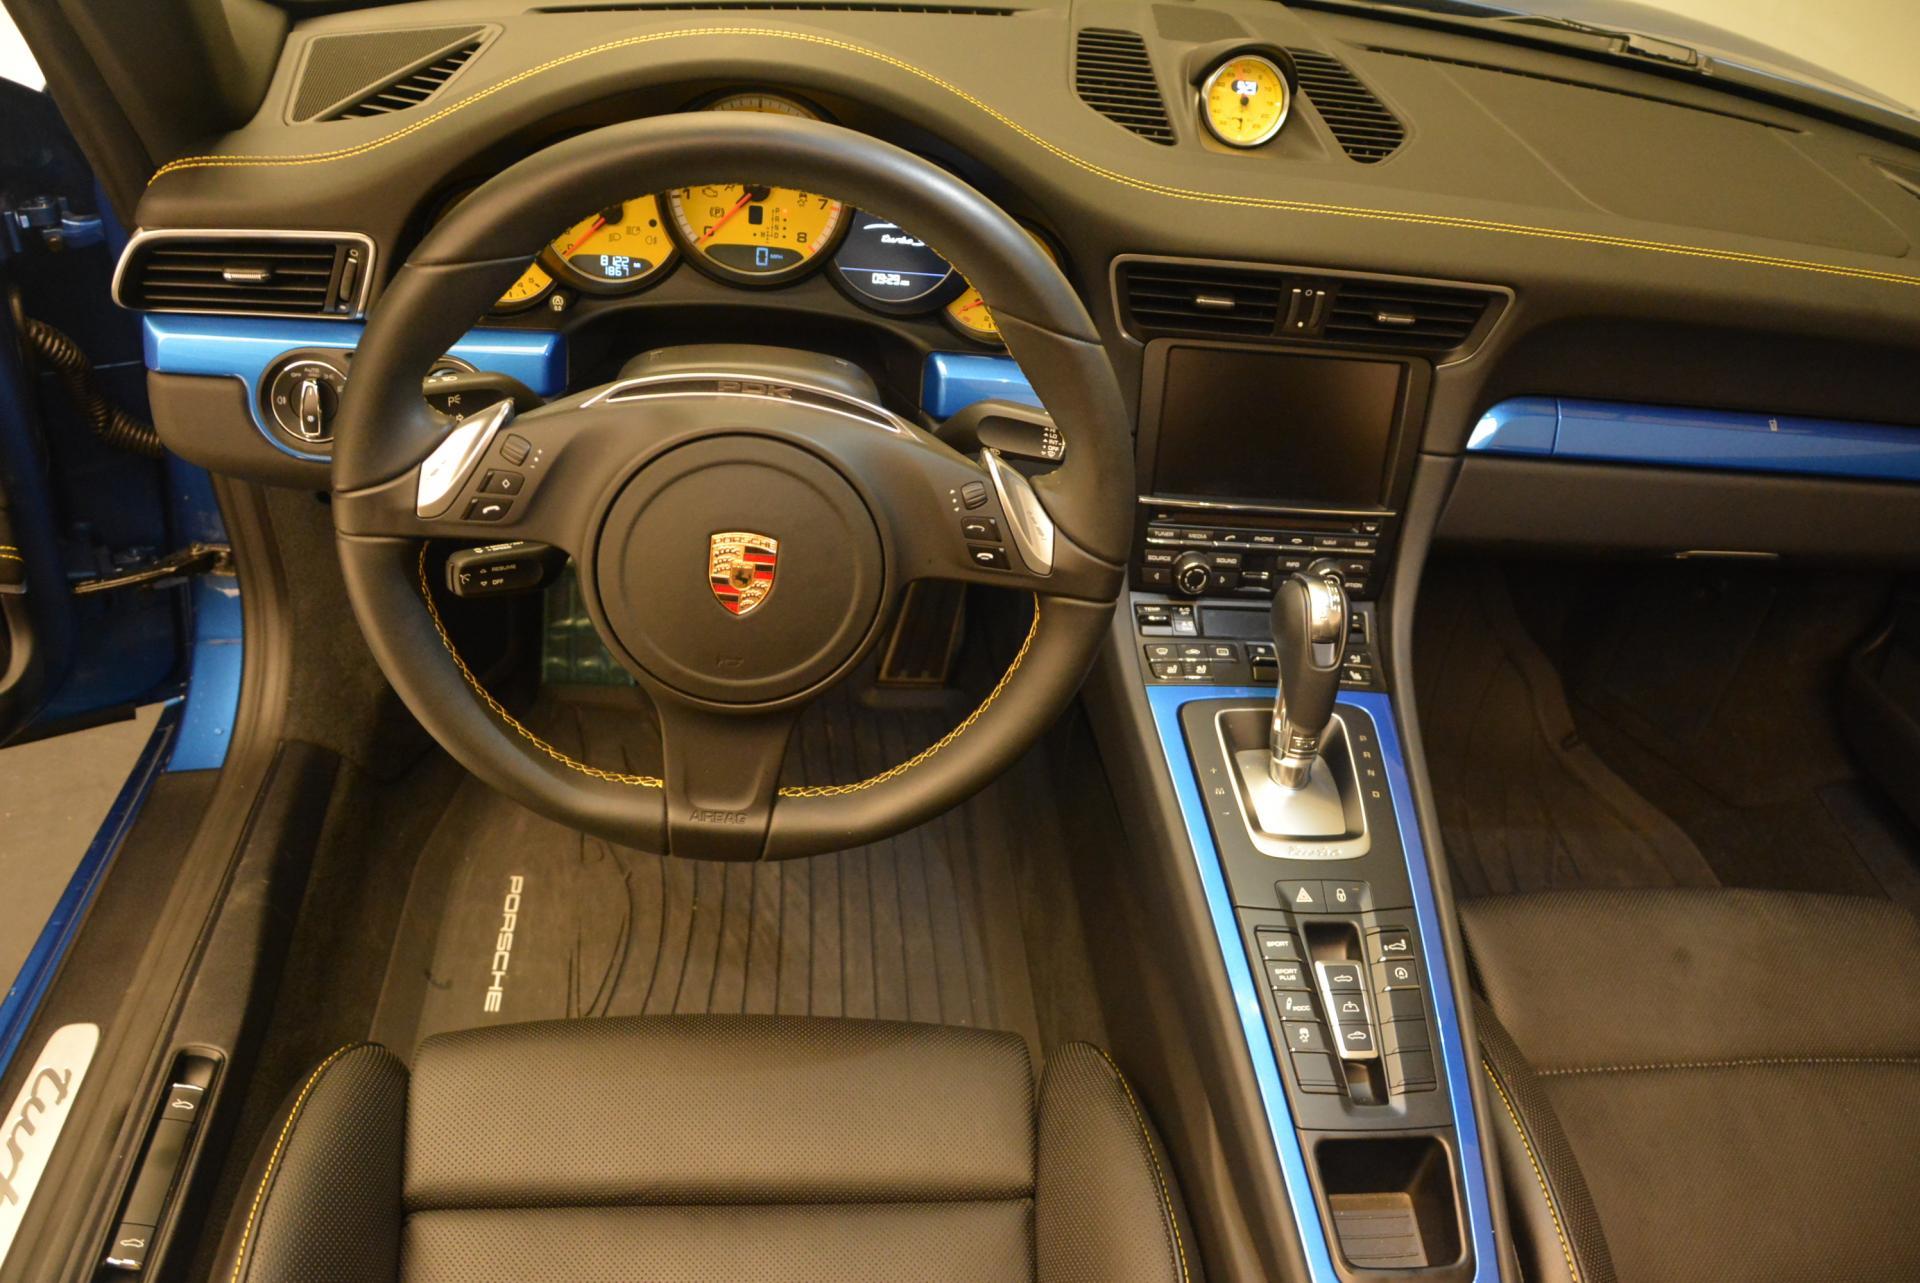 Used 2014 Porsche 911 Turbo S For Sale In Greenwich, CT 105_p19